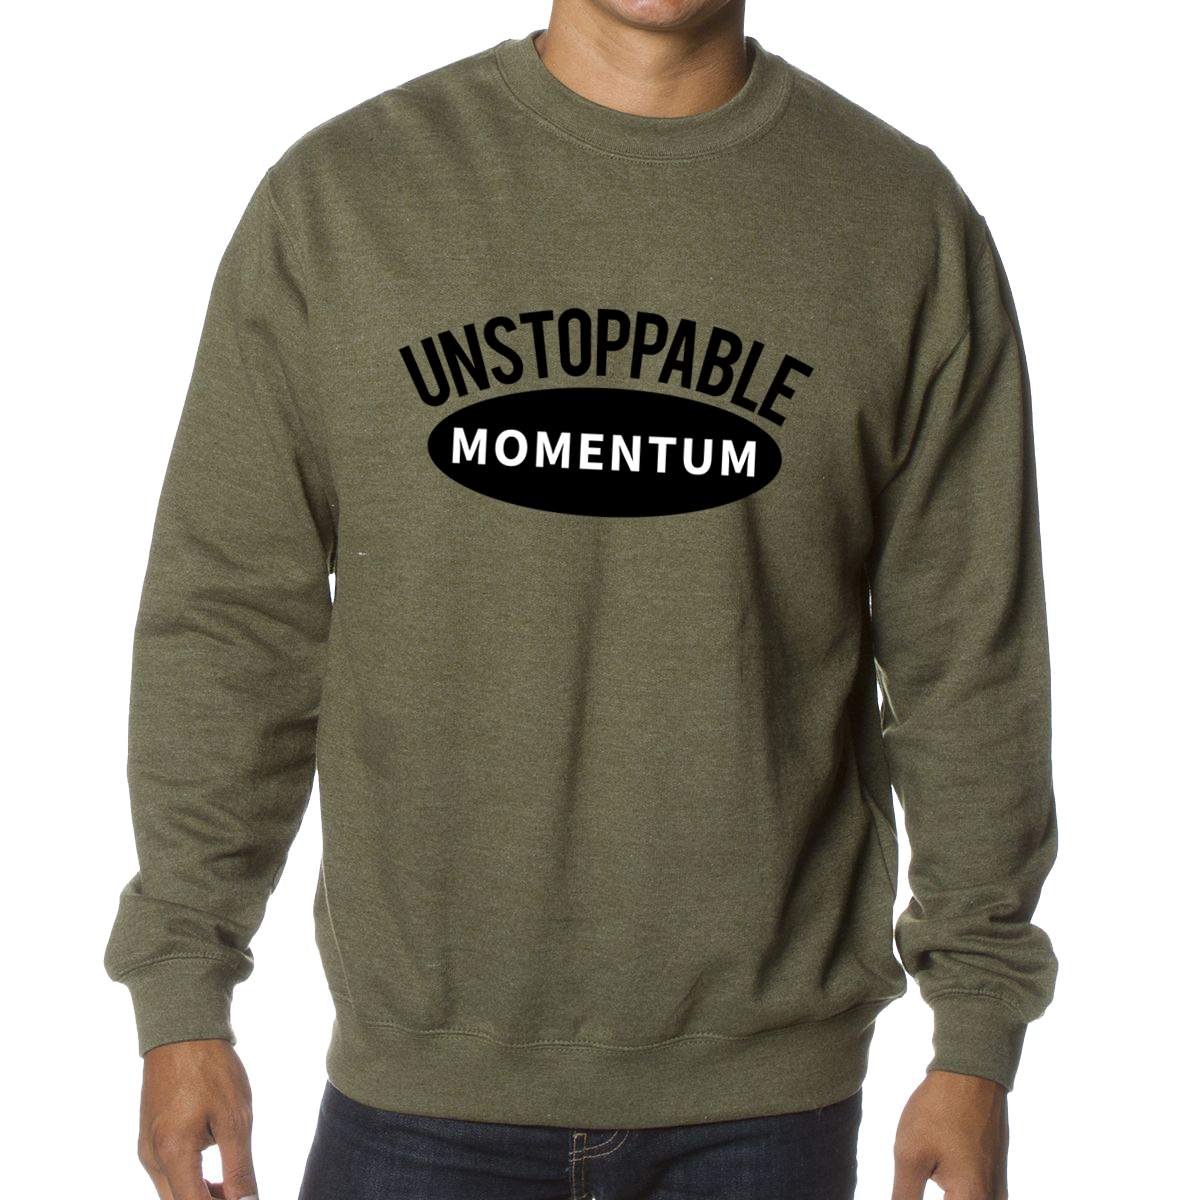 AI-HIPR-SS3000-independenttradingcompanymensmidweightcrewnecksweatshirt-APP#unstoppablemomentum-2color